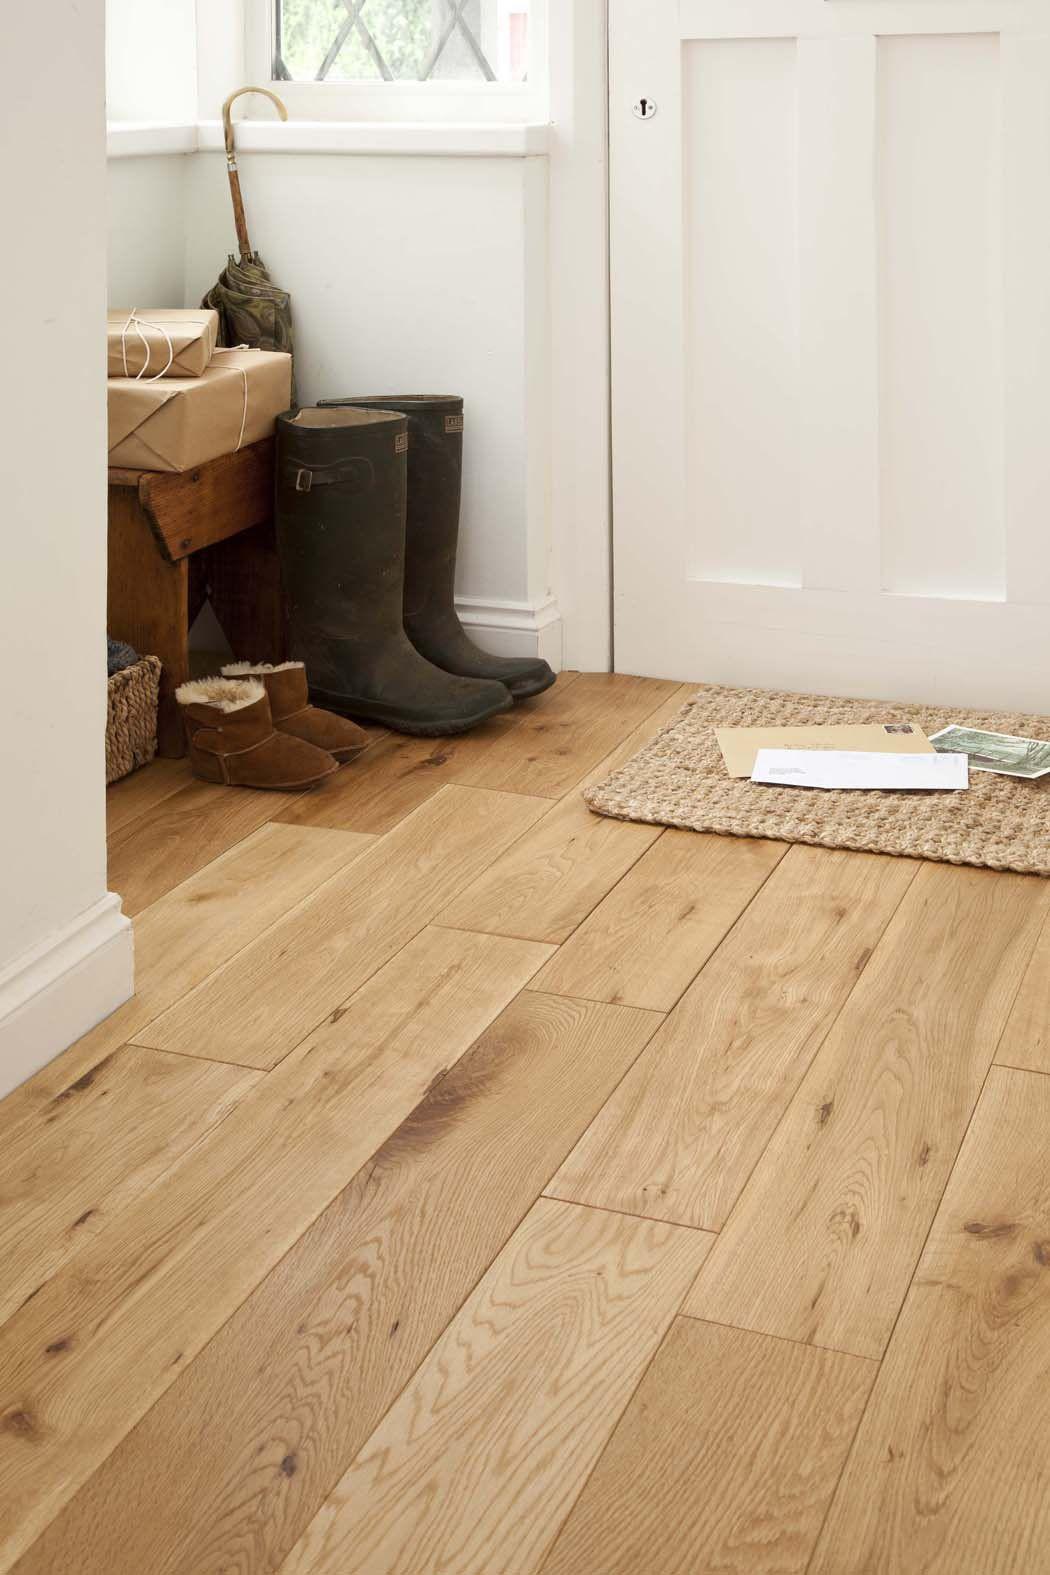 Interiordesign ukfd floors in flooring hardwood floors